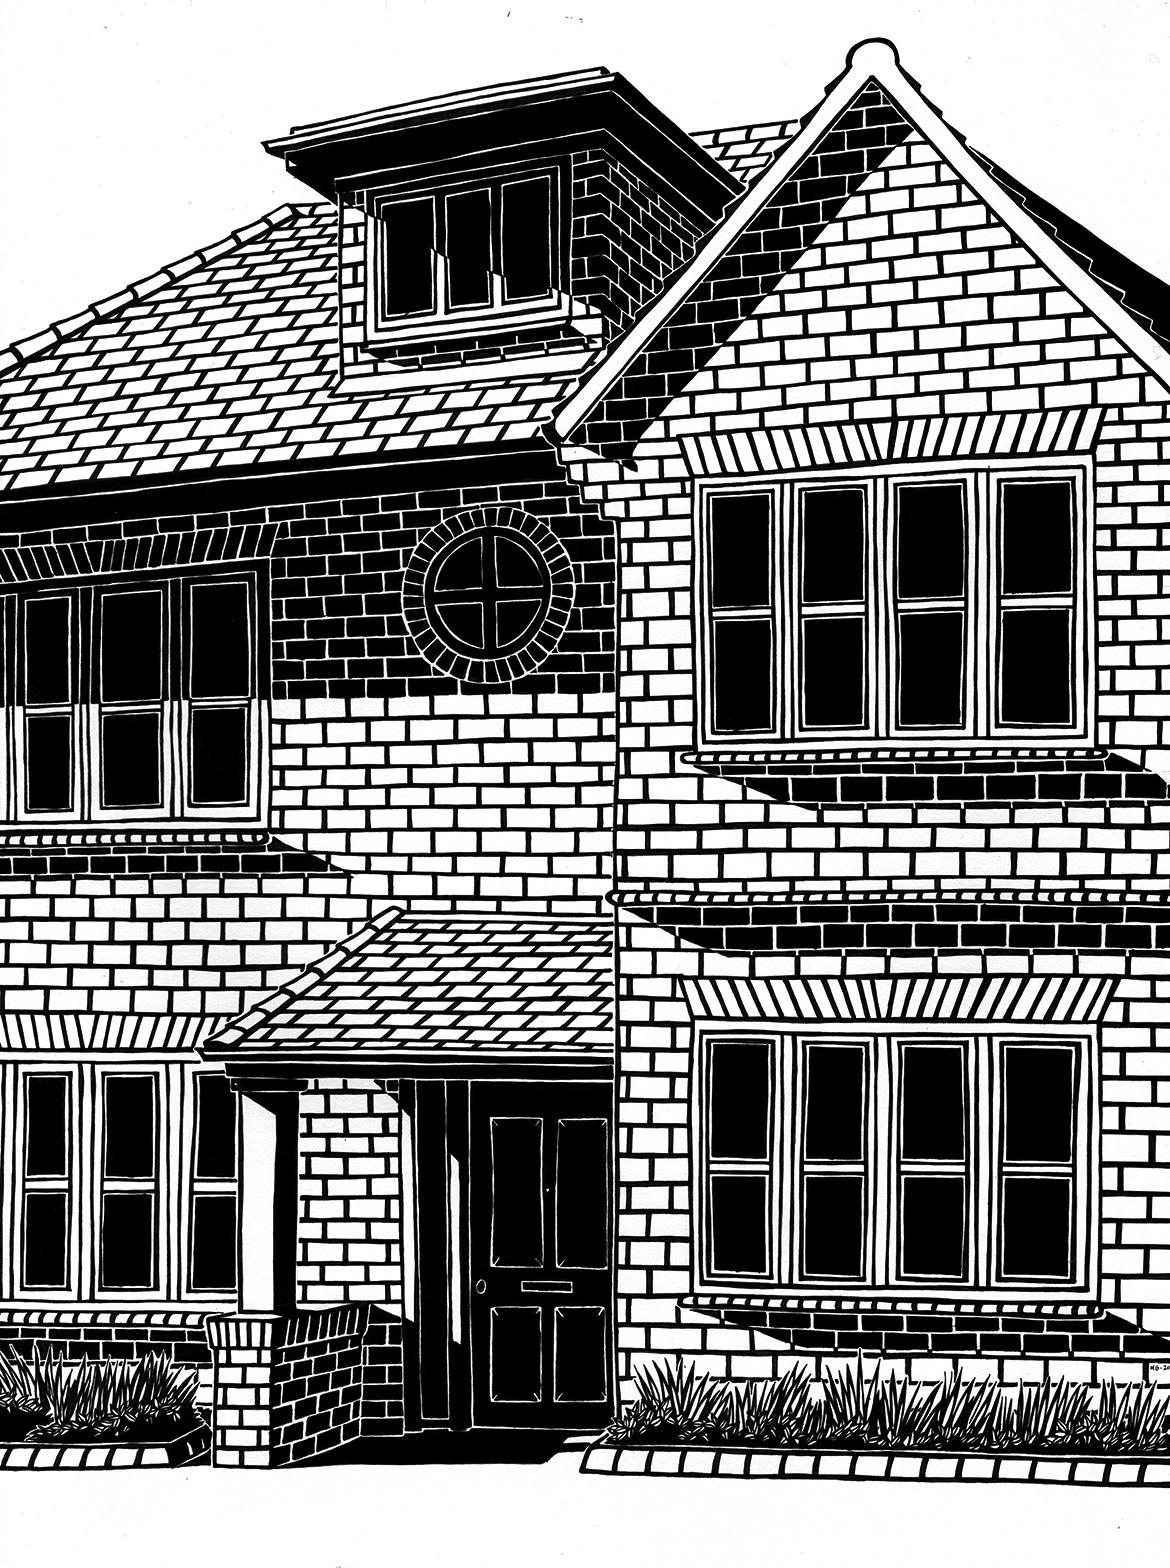 Single Family House #8